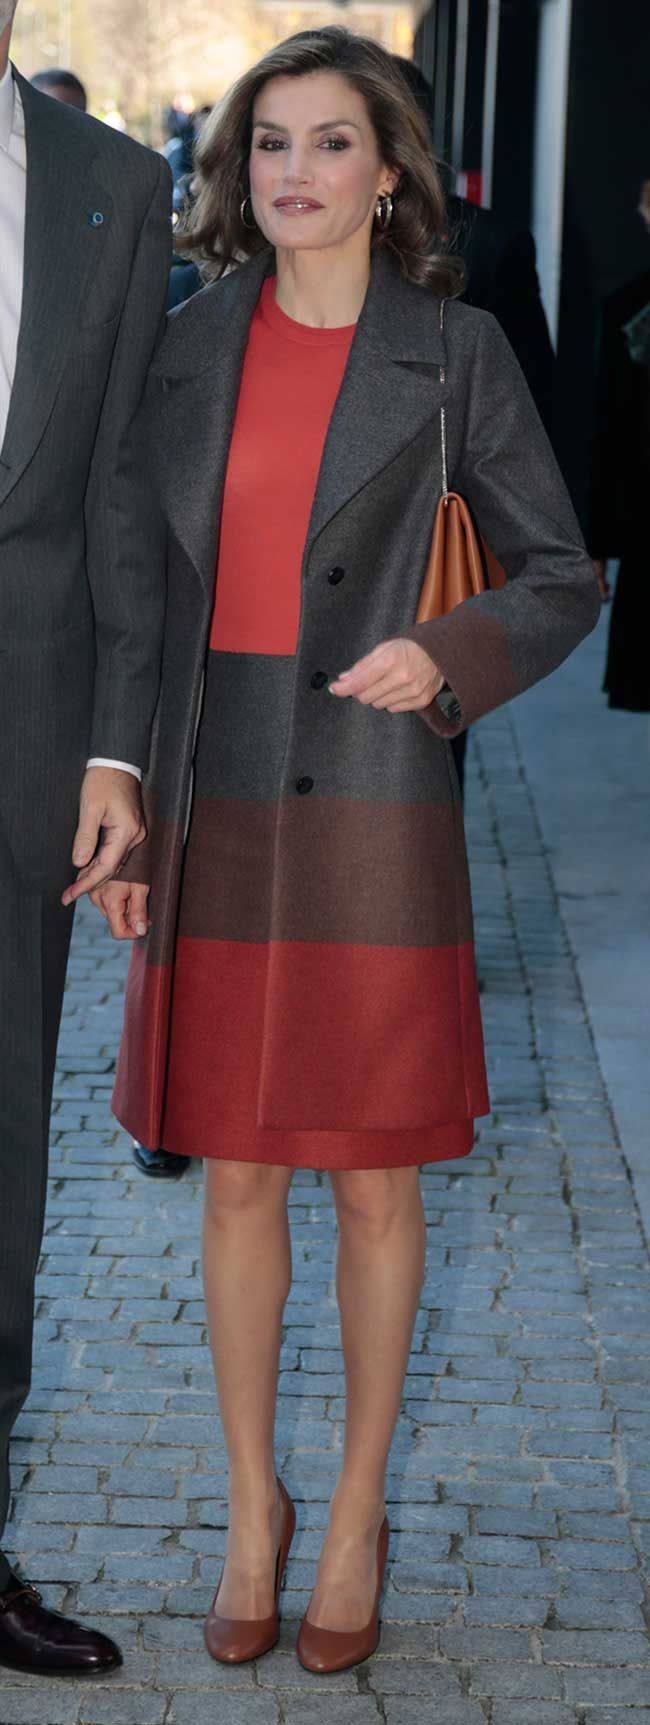 Queen Letizia during her State Visit to Portugal- Nov.28-Nov.30, 2016